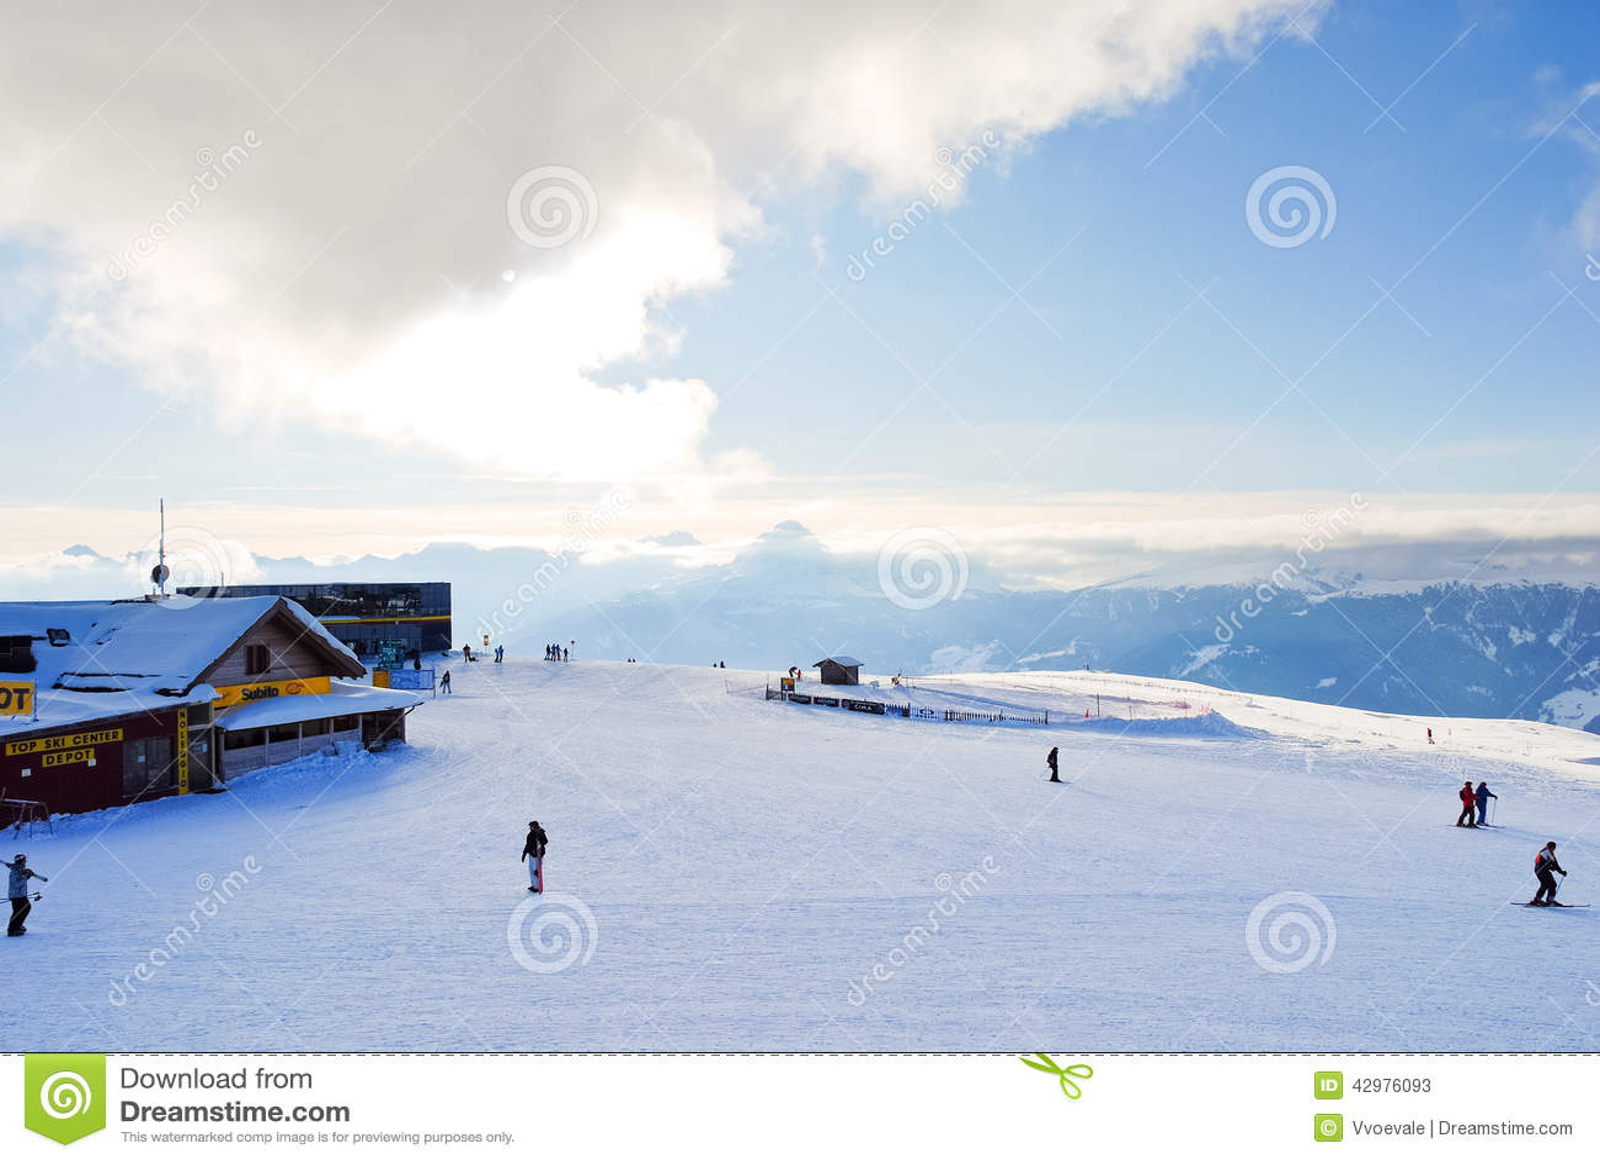 Skisport en Val Gardena, dolomías, Italia